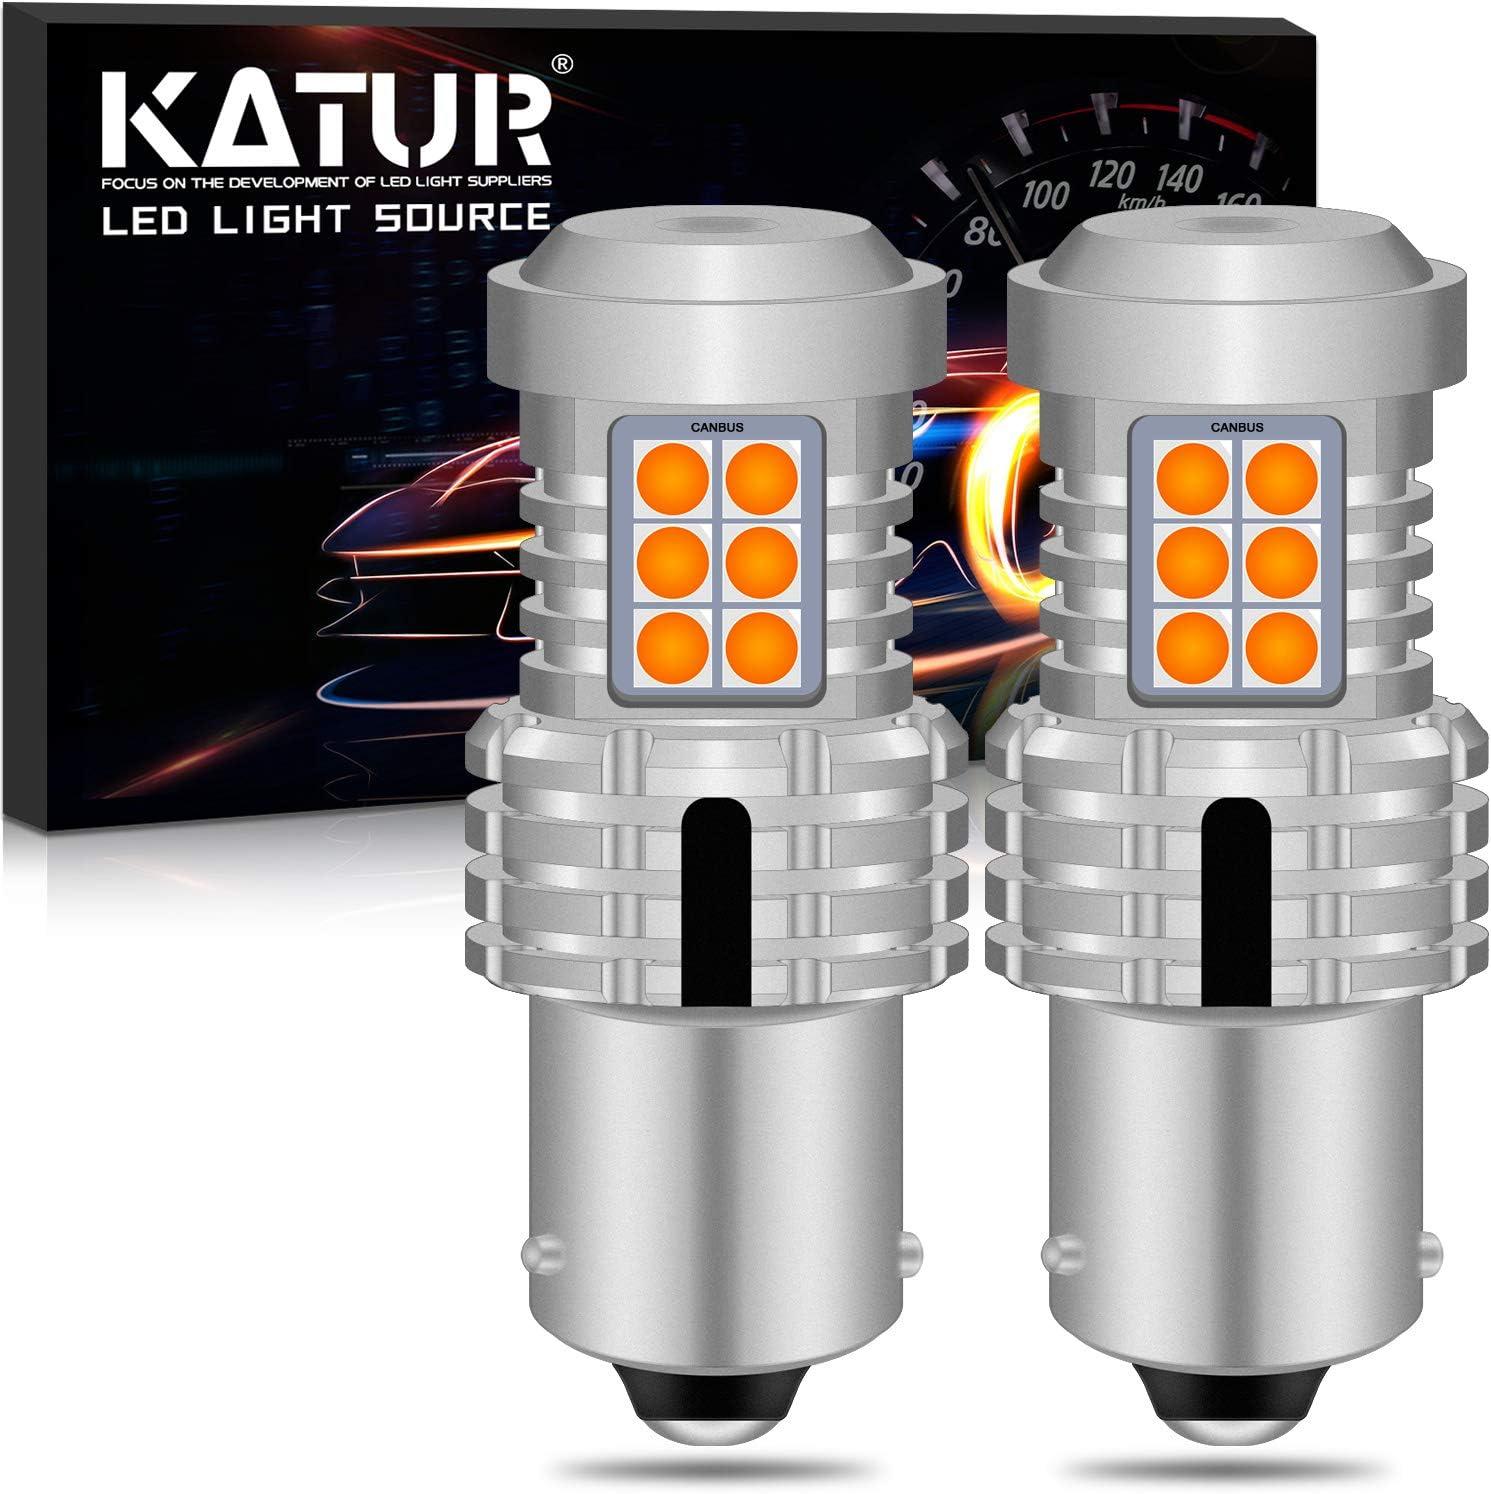 KATUR BAU15S PY21W 7507 Bombillas LED Superbrillantes 12pcs 3030 y 8pcs 3020 Chips Canbus Error Señal de Giro Libre Freno Trasero Cola de estacionamiento Luces,Ámbar Amarillo(Paquete de 2)